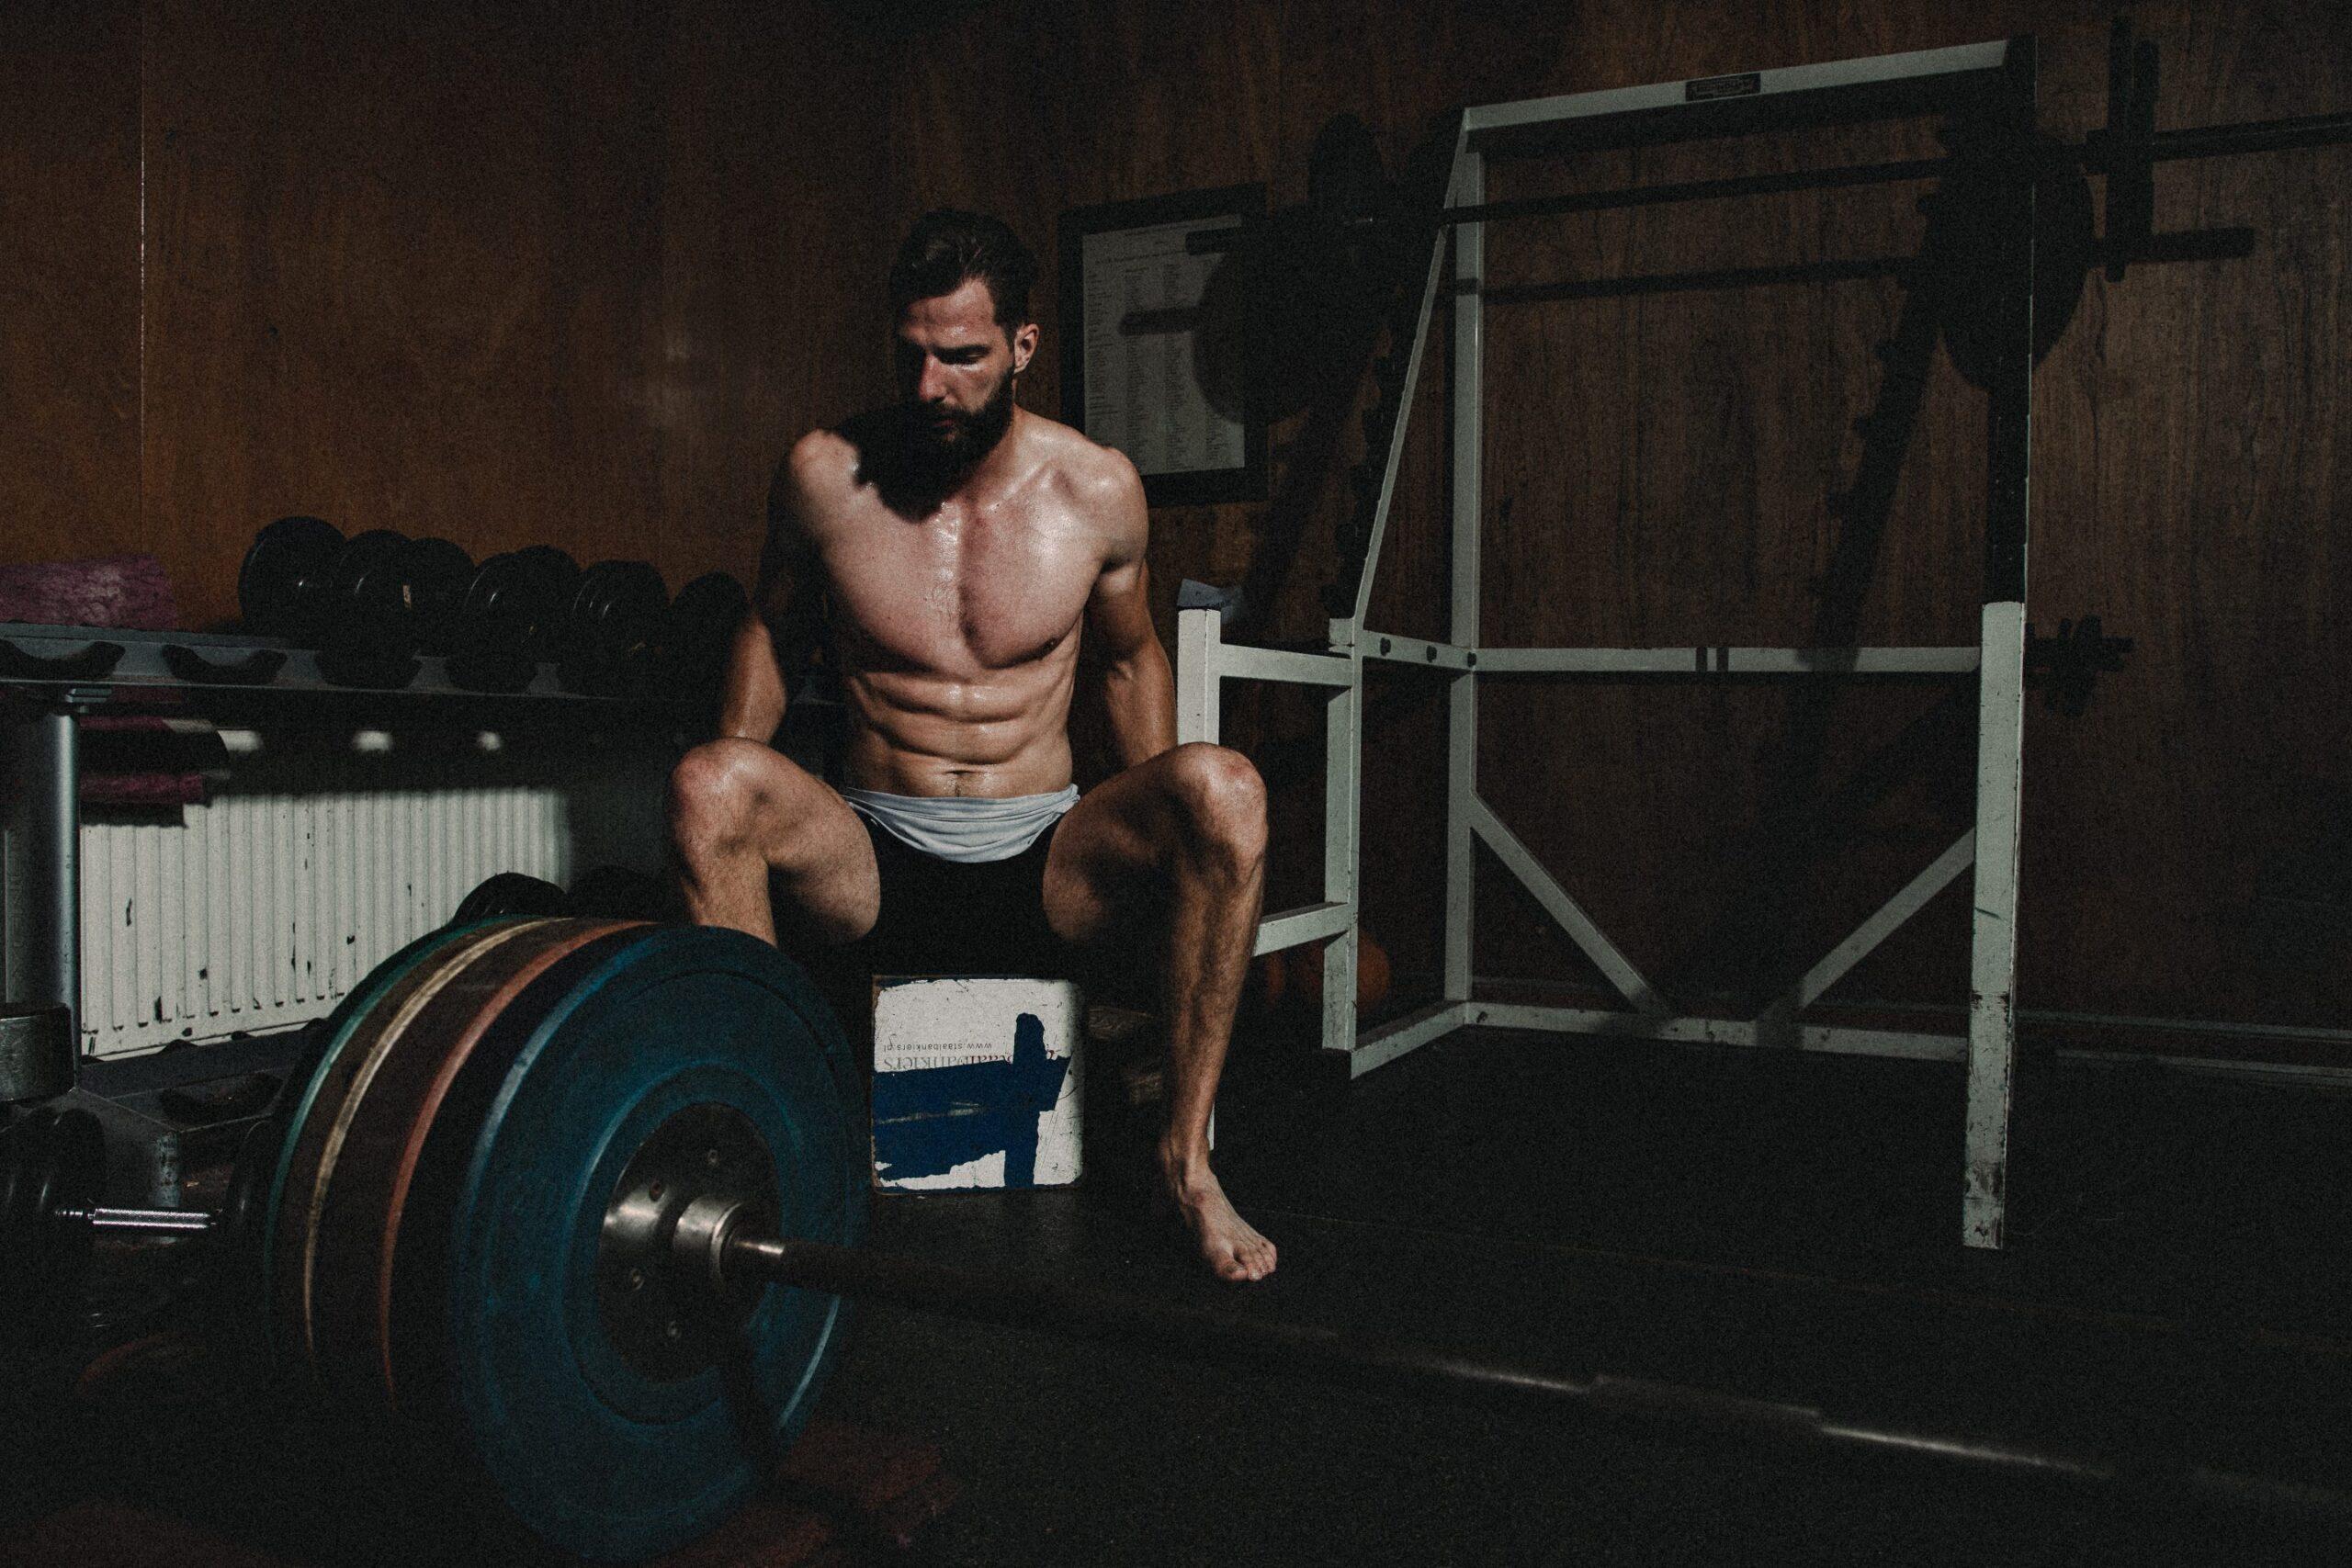 portfolio foto atleet die krachtraining doet